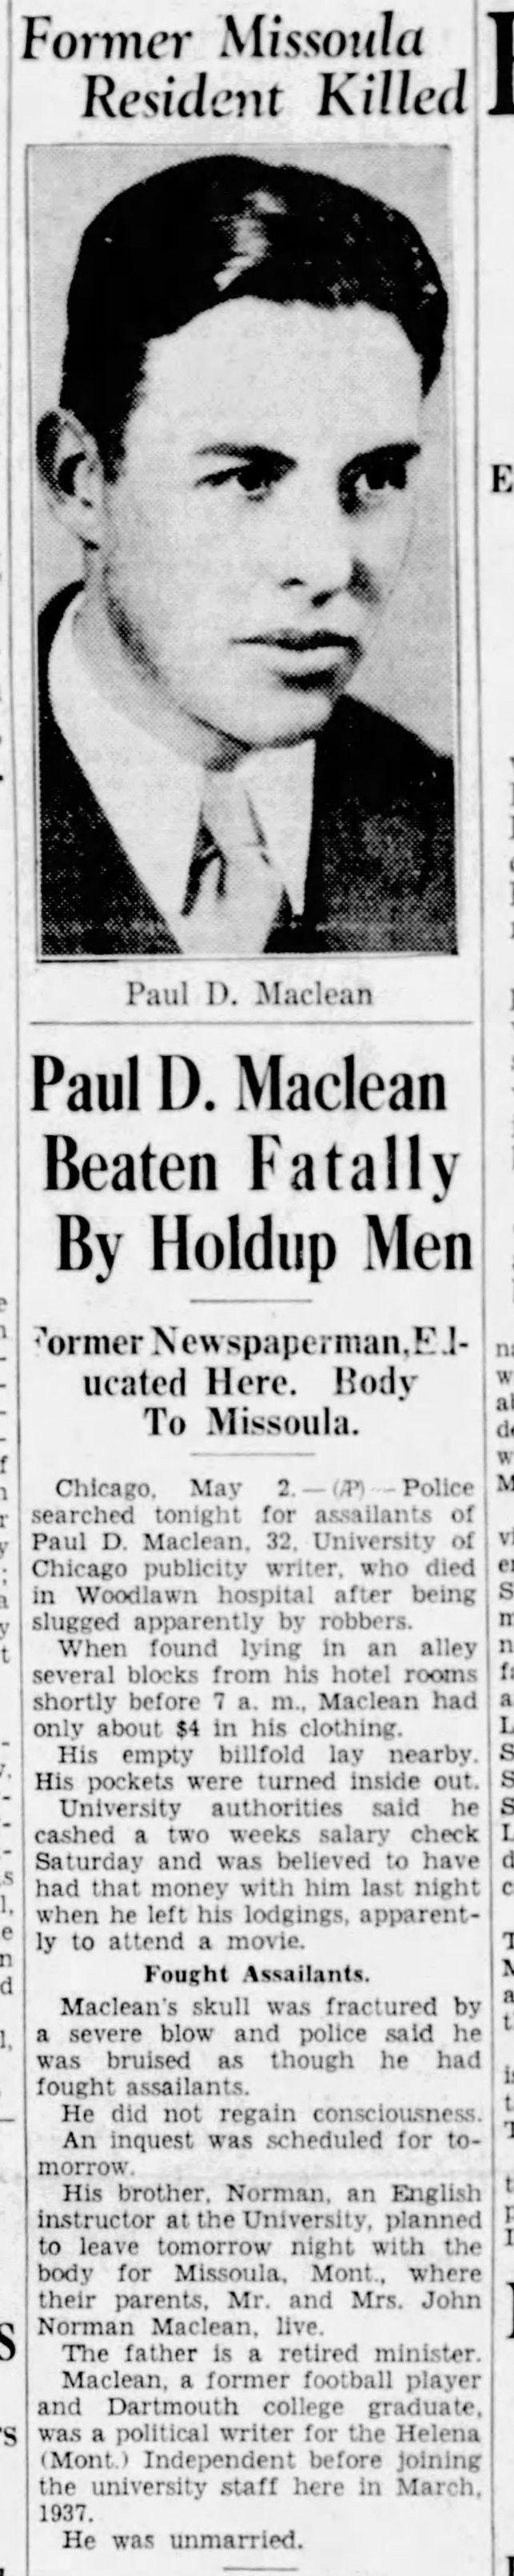 Paul Maclean beaten fatally by holdup men 1938